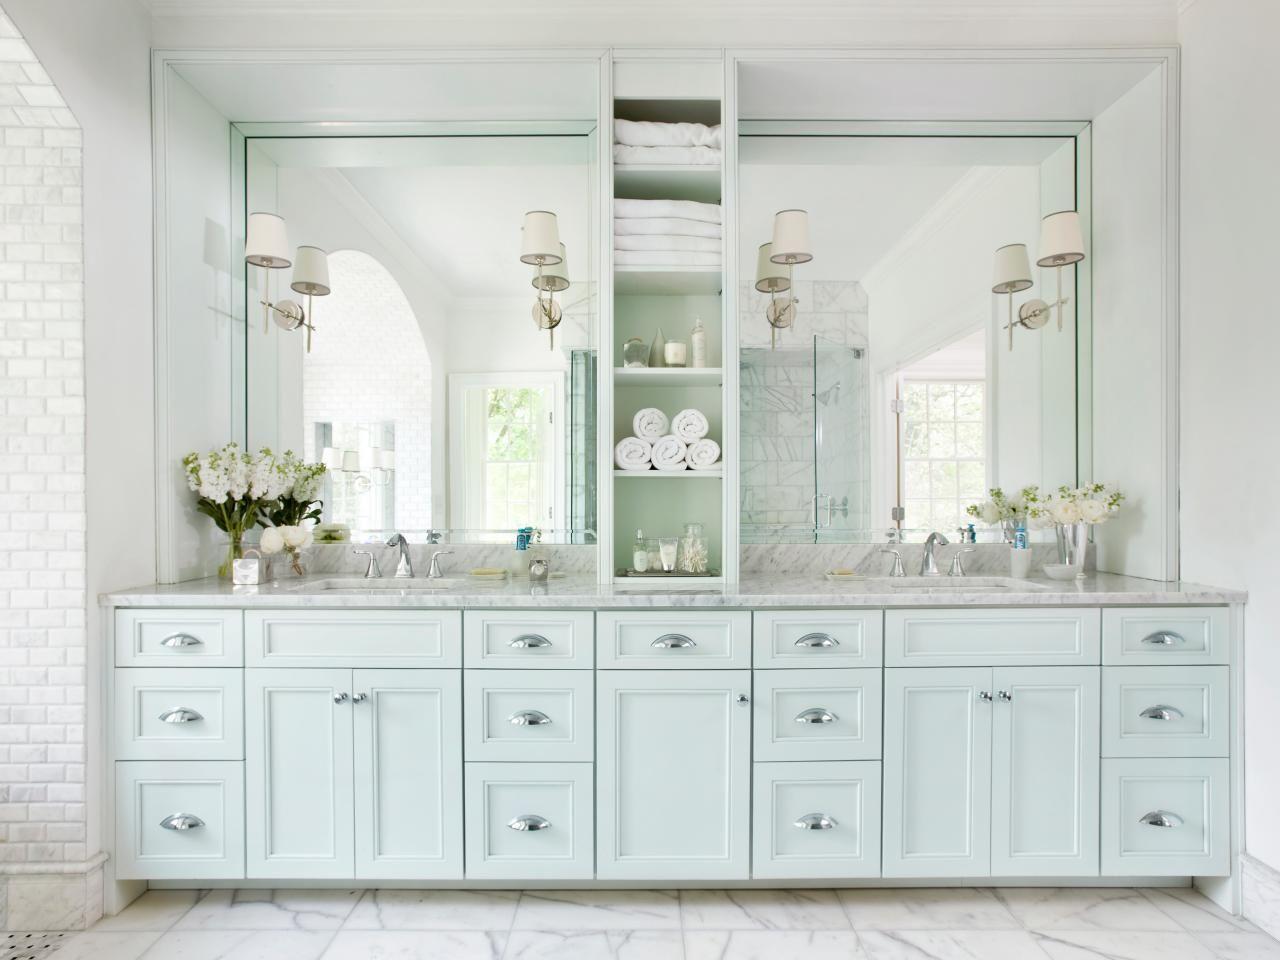 Bathroom Vanity Brick wall interior Pinterest Large framed